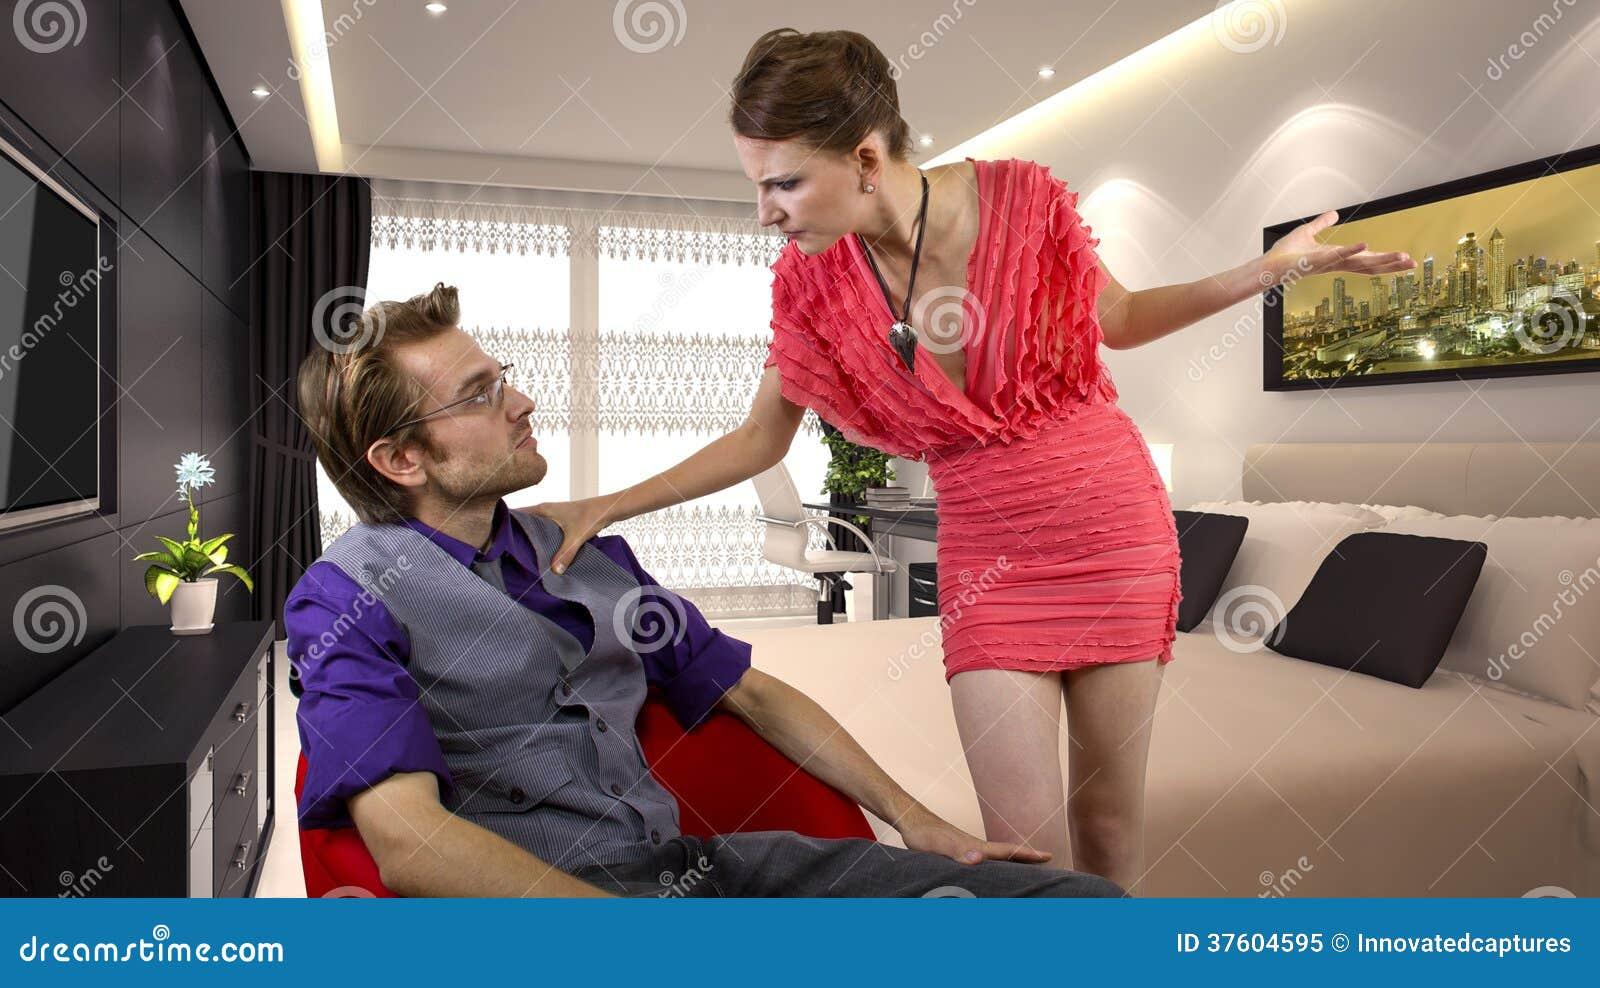 Dominant girlfriend